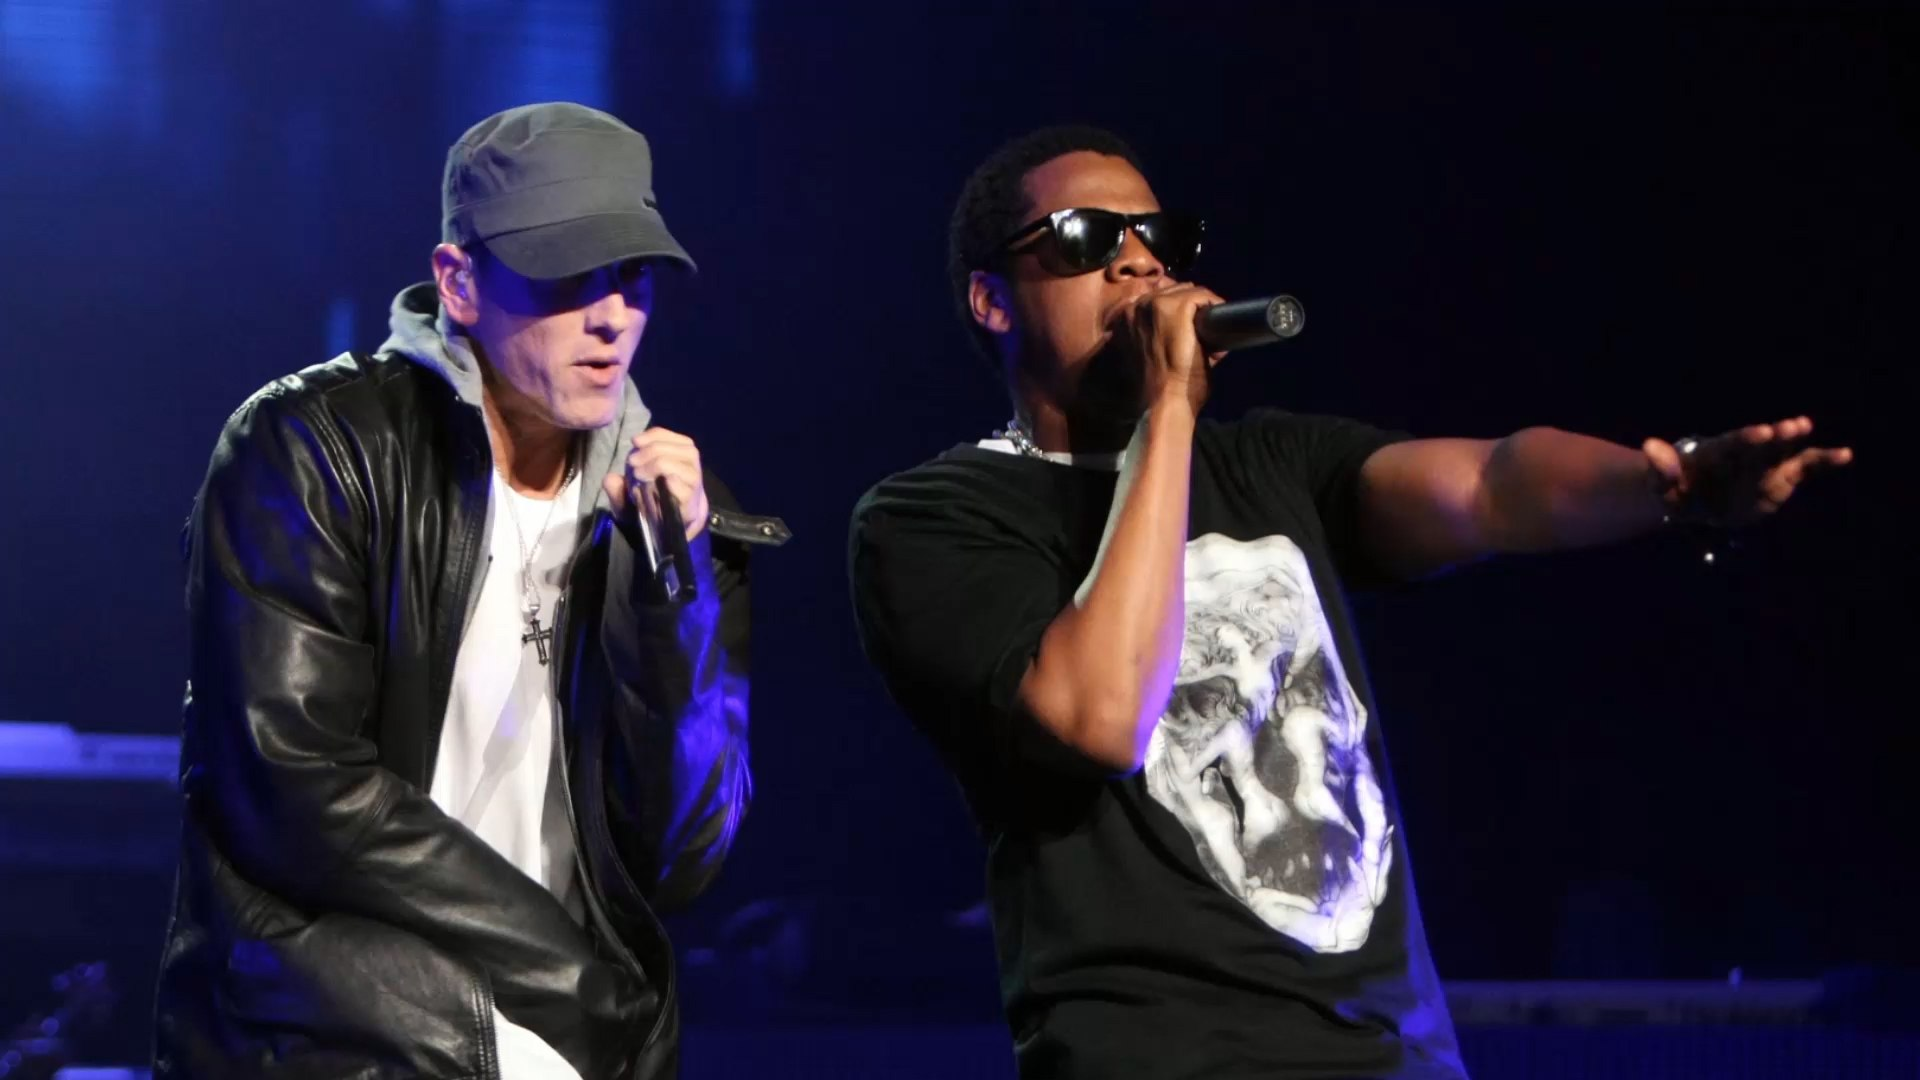 Eminem ties Jay-Z for 'Billboard' Top 10 Count